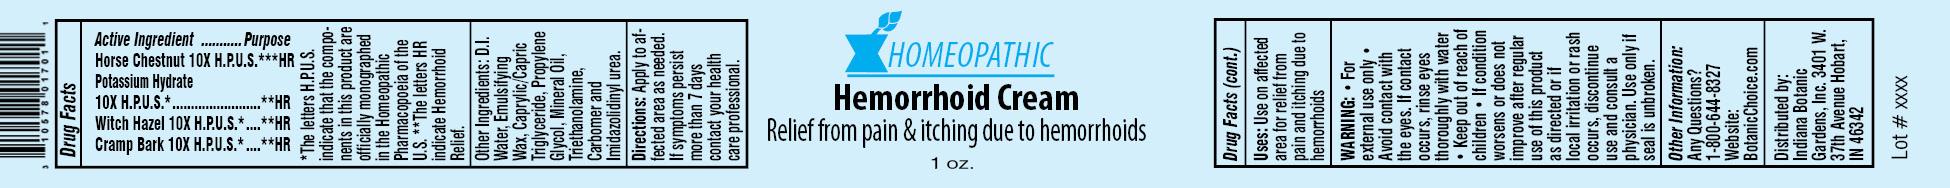 Homeopathic Hemorrhoid | Horse Chestnut, Potassium Hydrate, Witch Hazel, Cramp Bark Cream while Breastfeeding